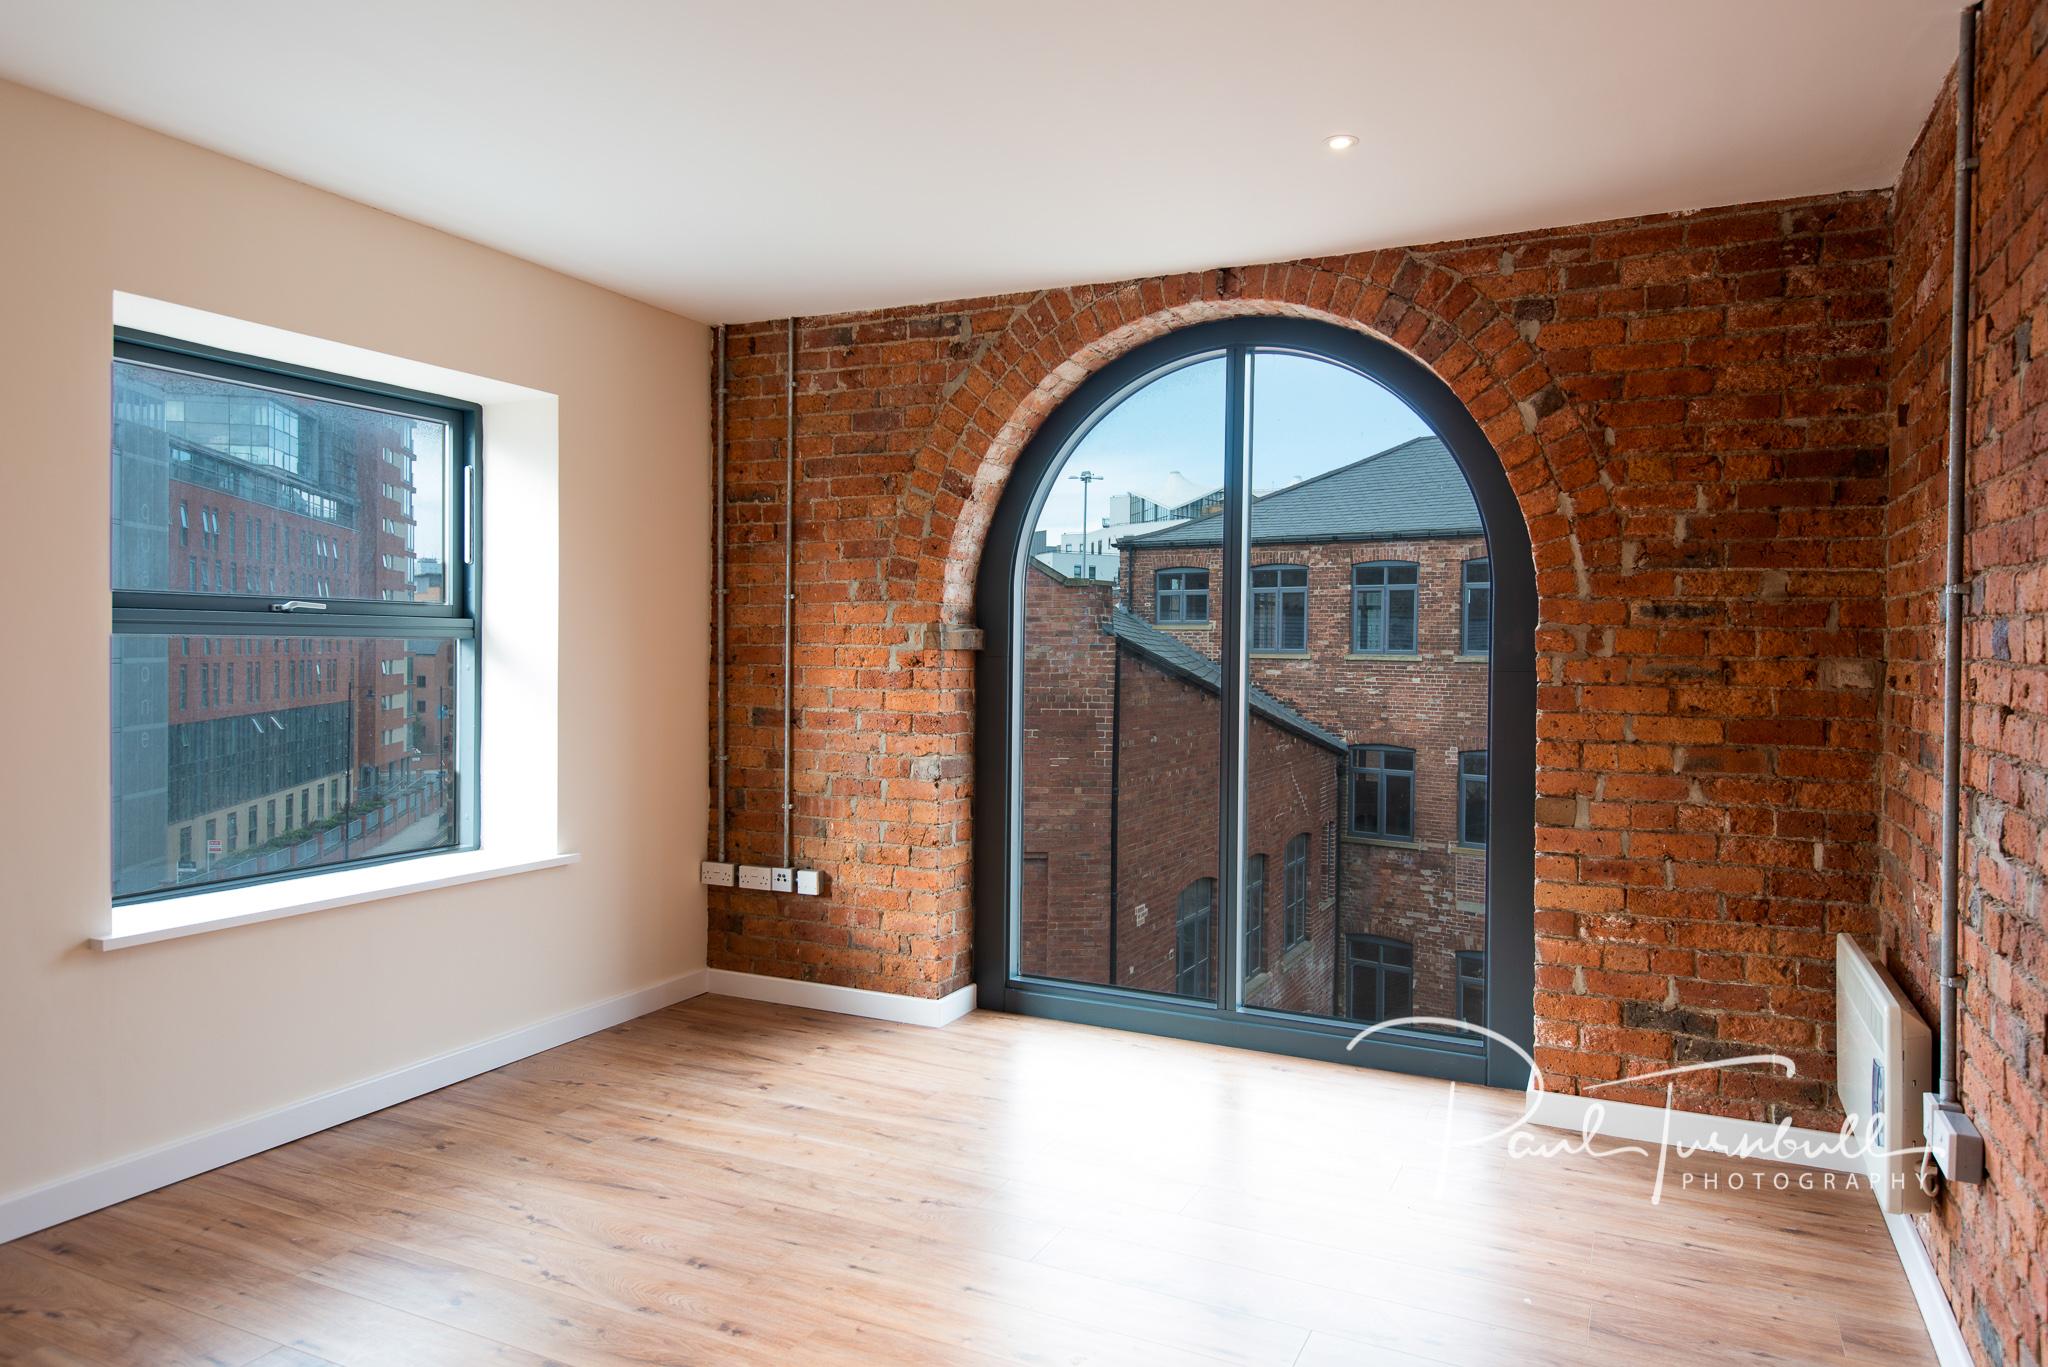 commercial-property-photographer-leeds-yorkshire-blackbrook-developments-033.jpg